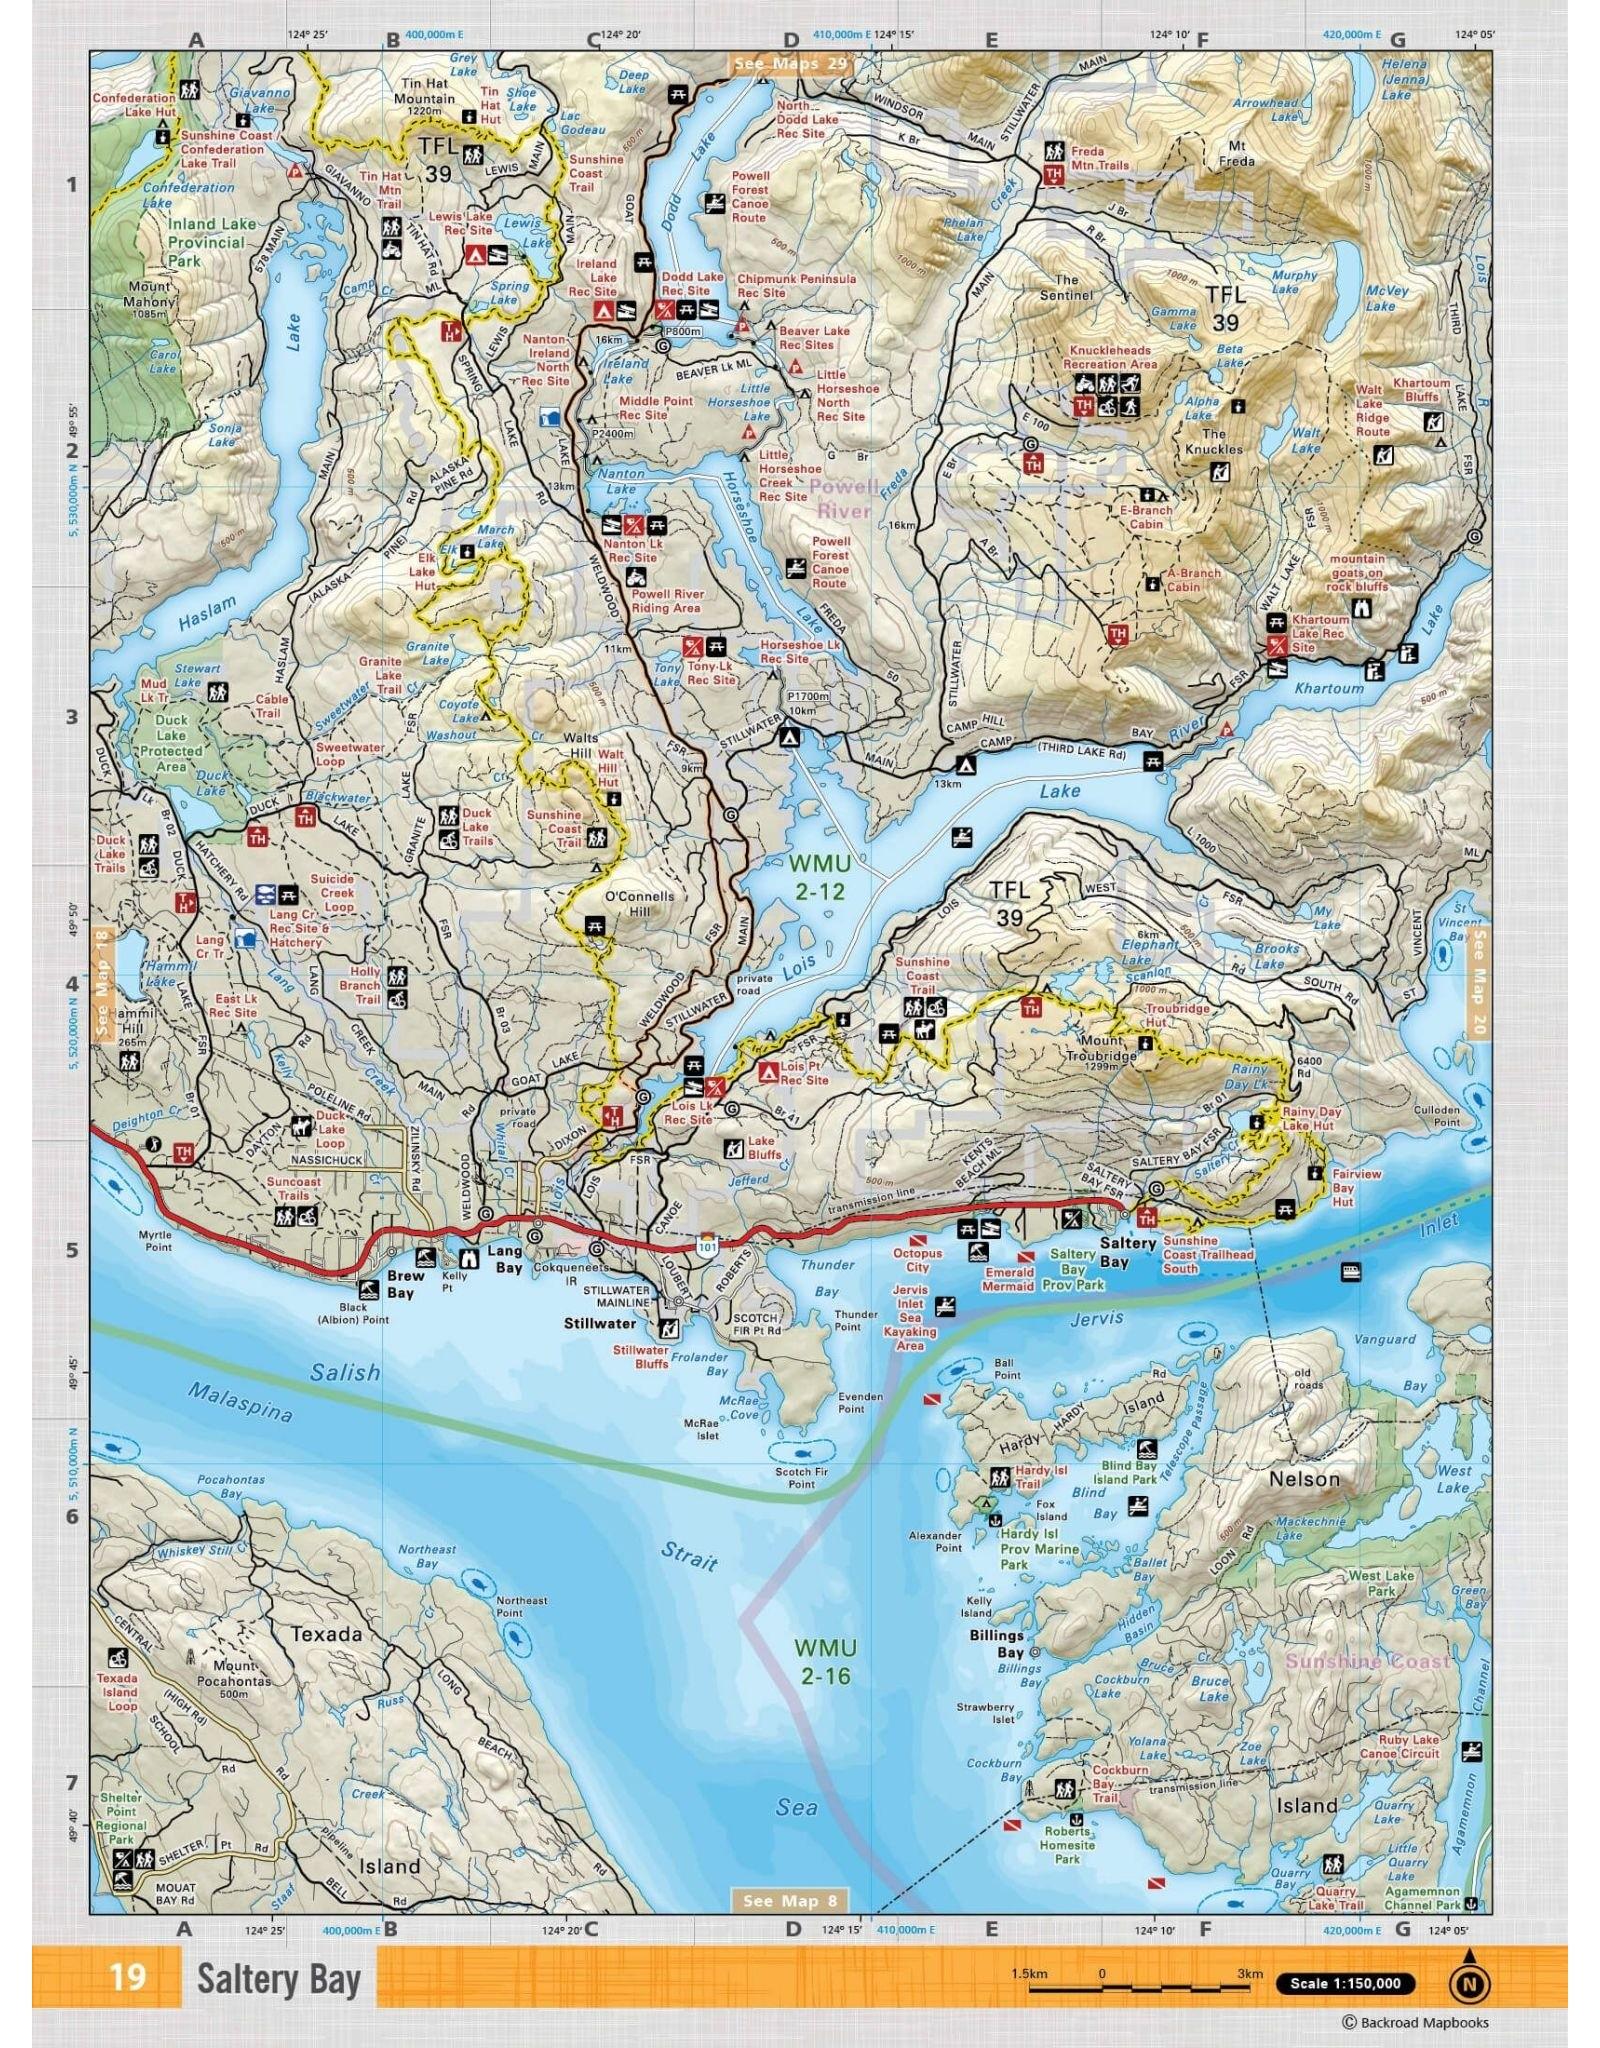 BRMB - TOPO MAP (VCBC-19-SALTERY BAY)